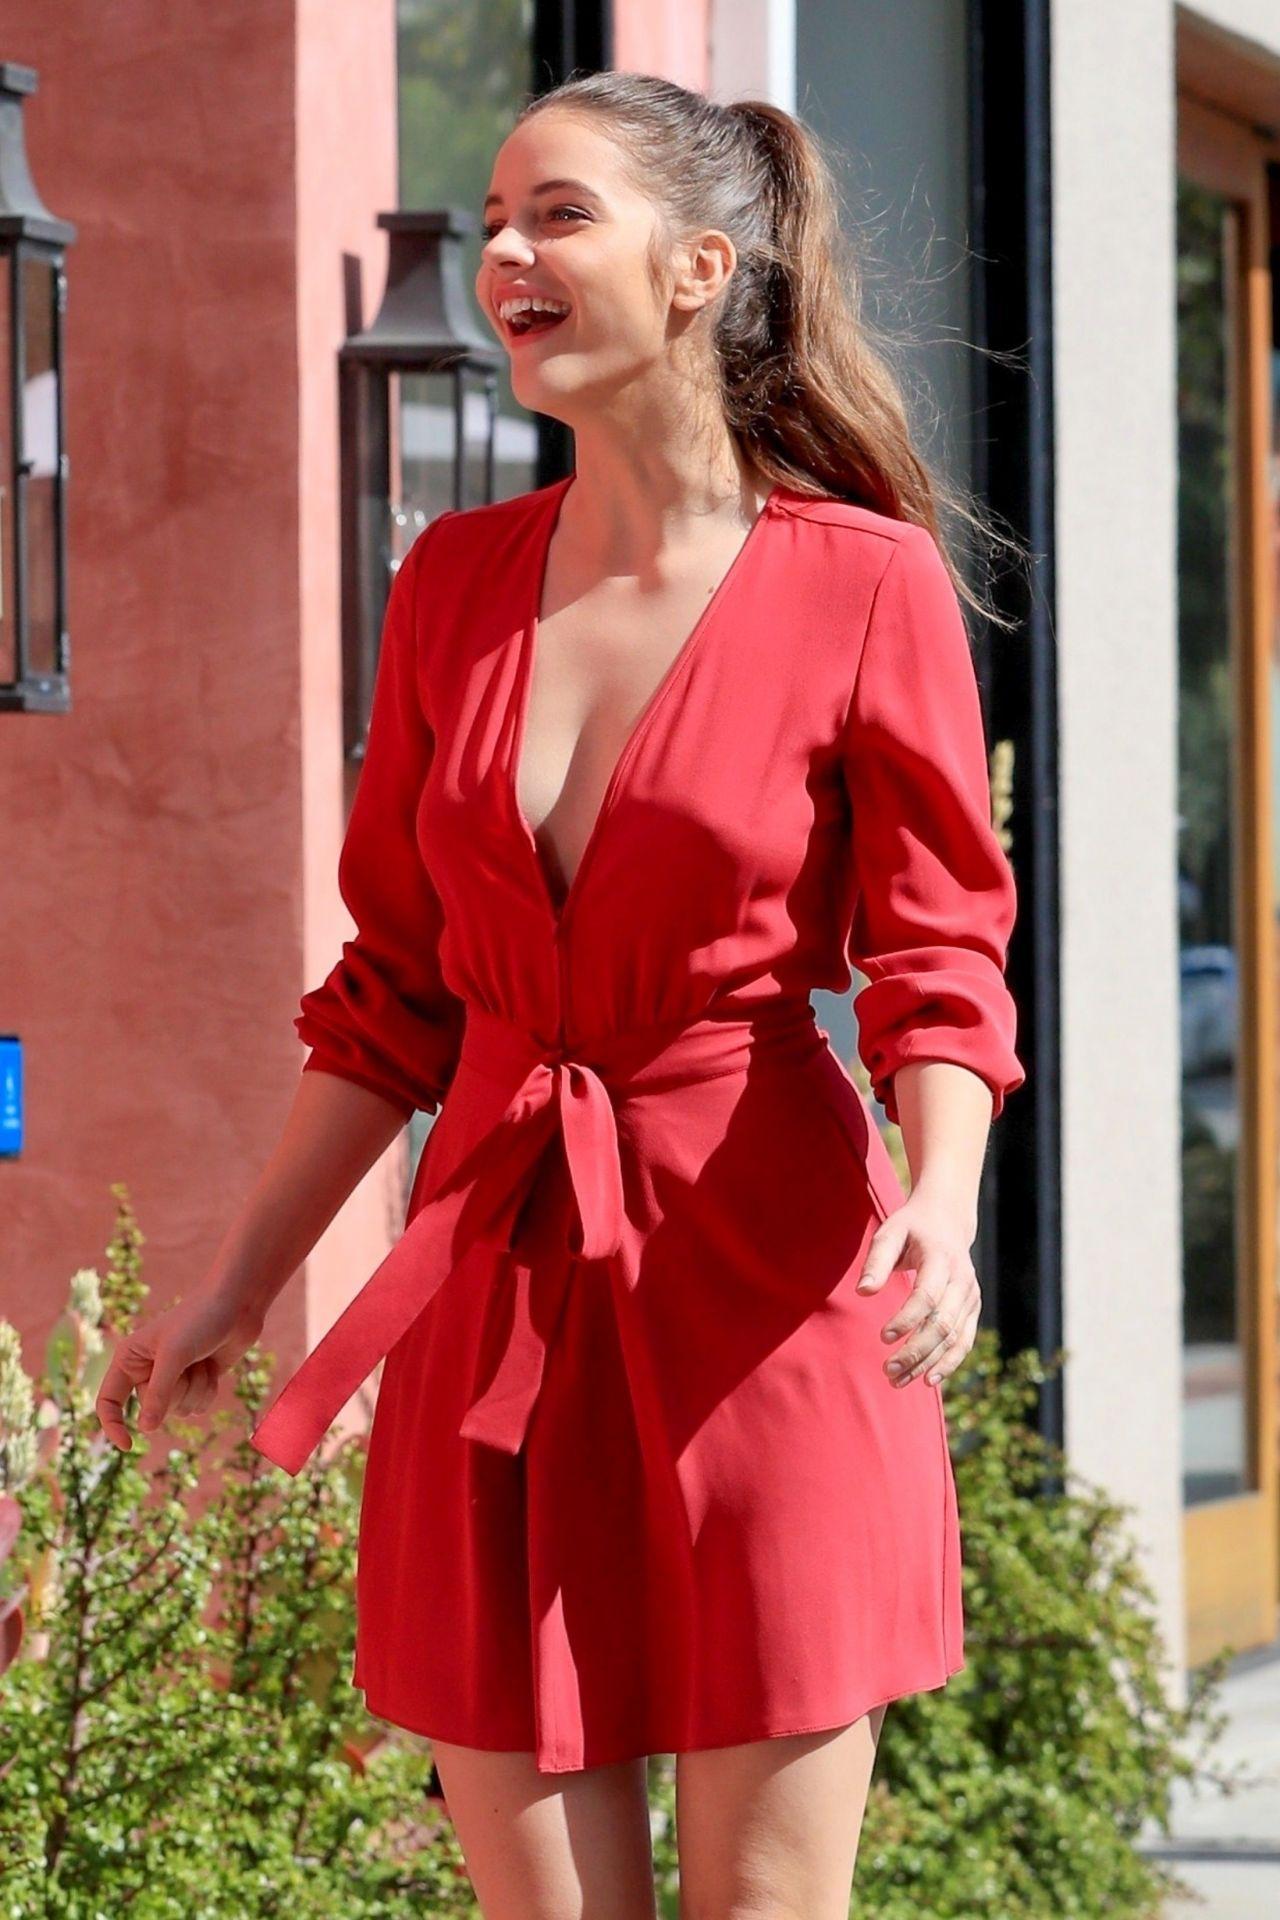 Barbara Palvin In A Red Mini Dress Armani Pop Up Store